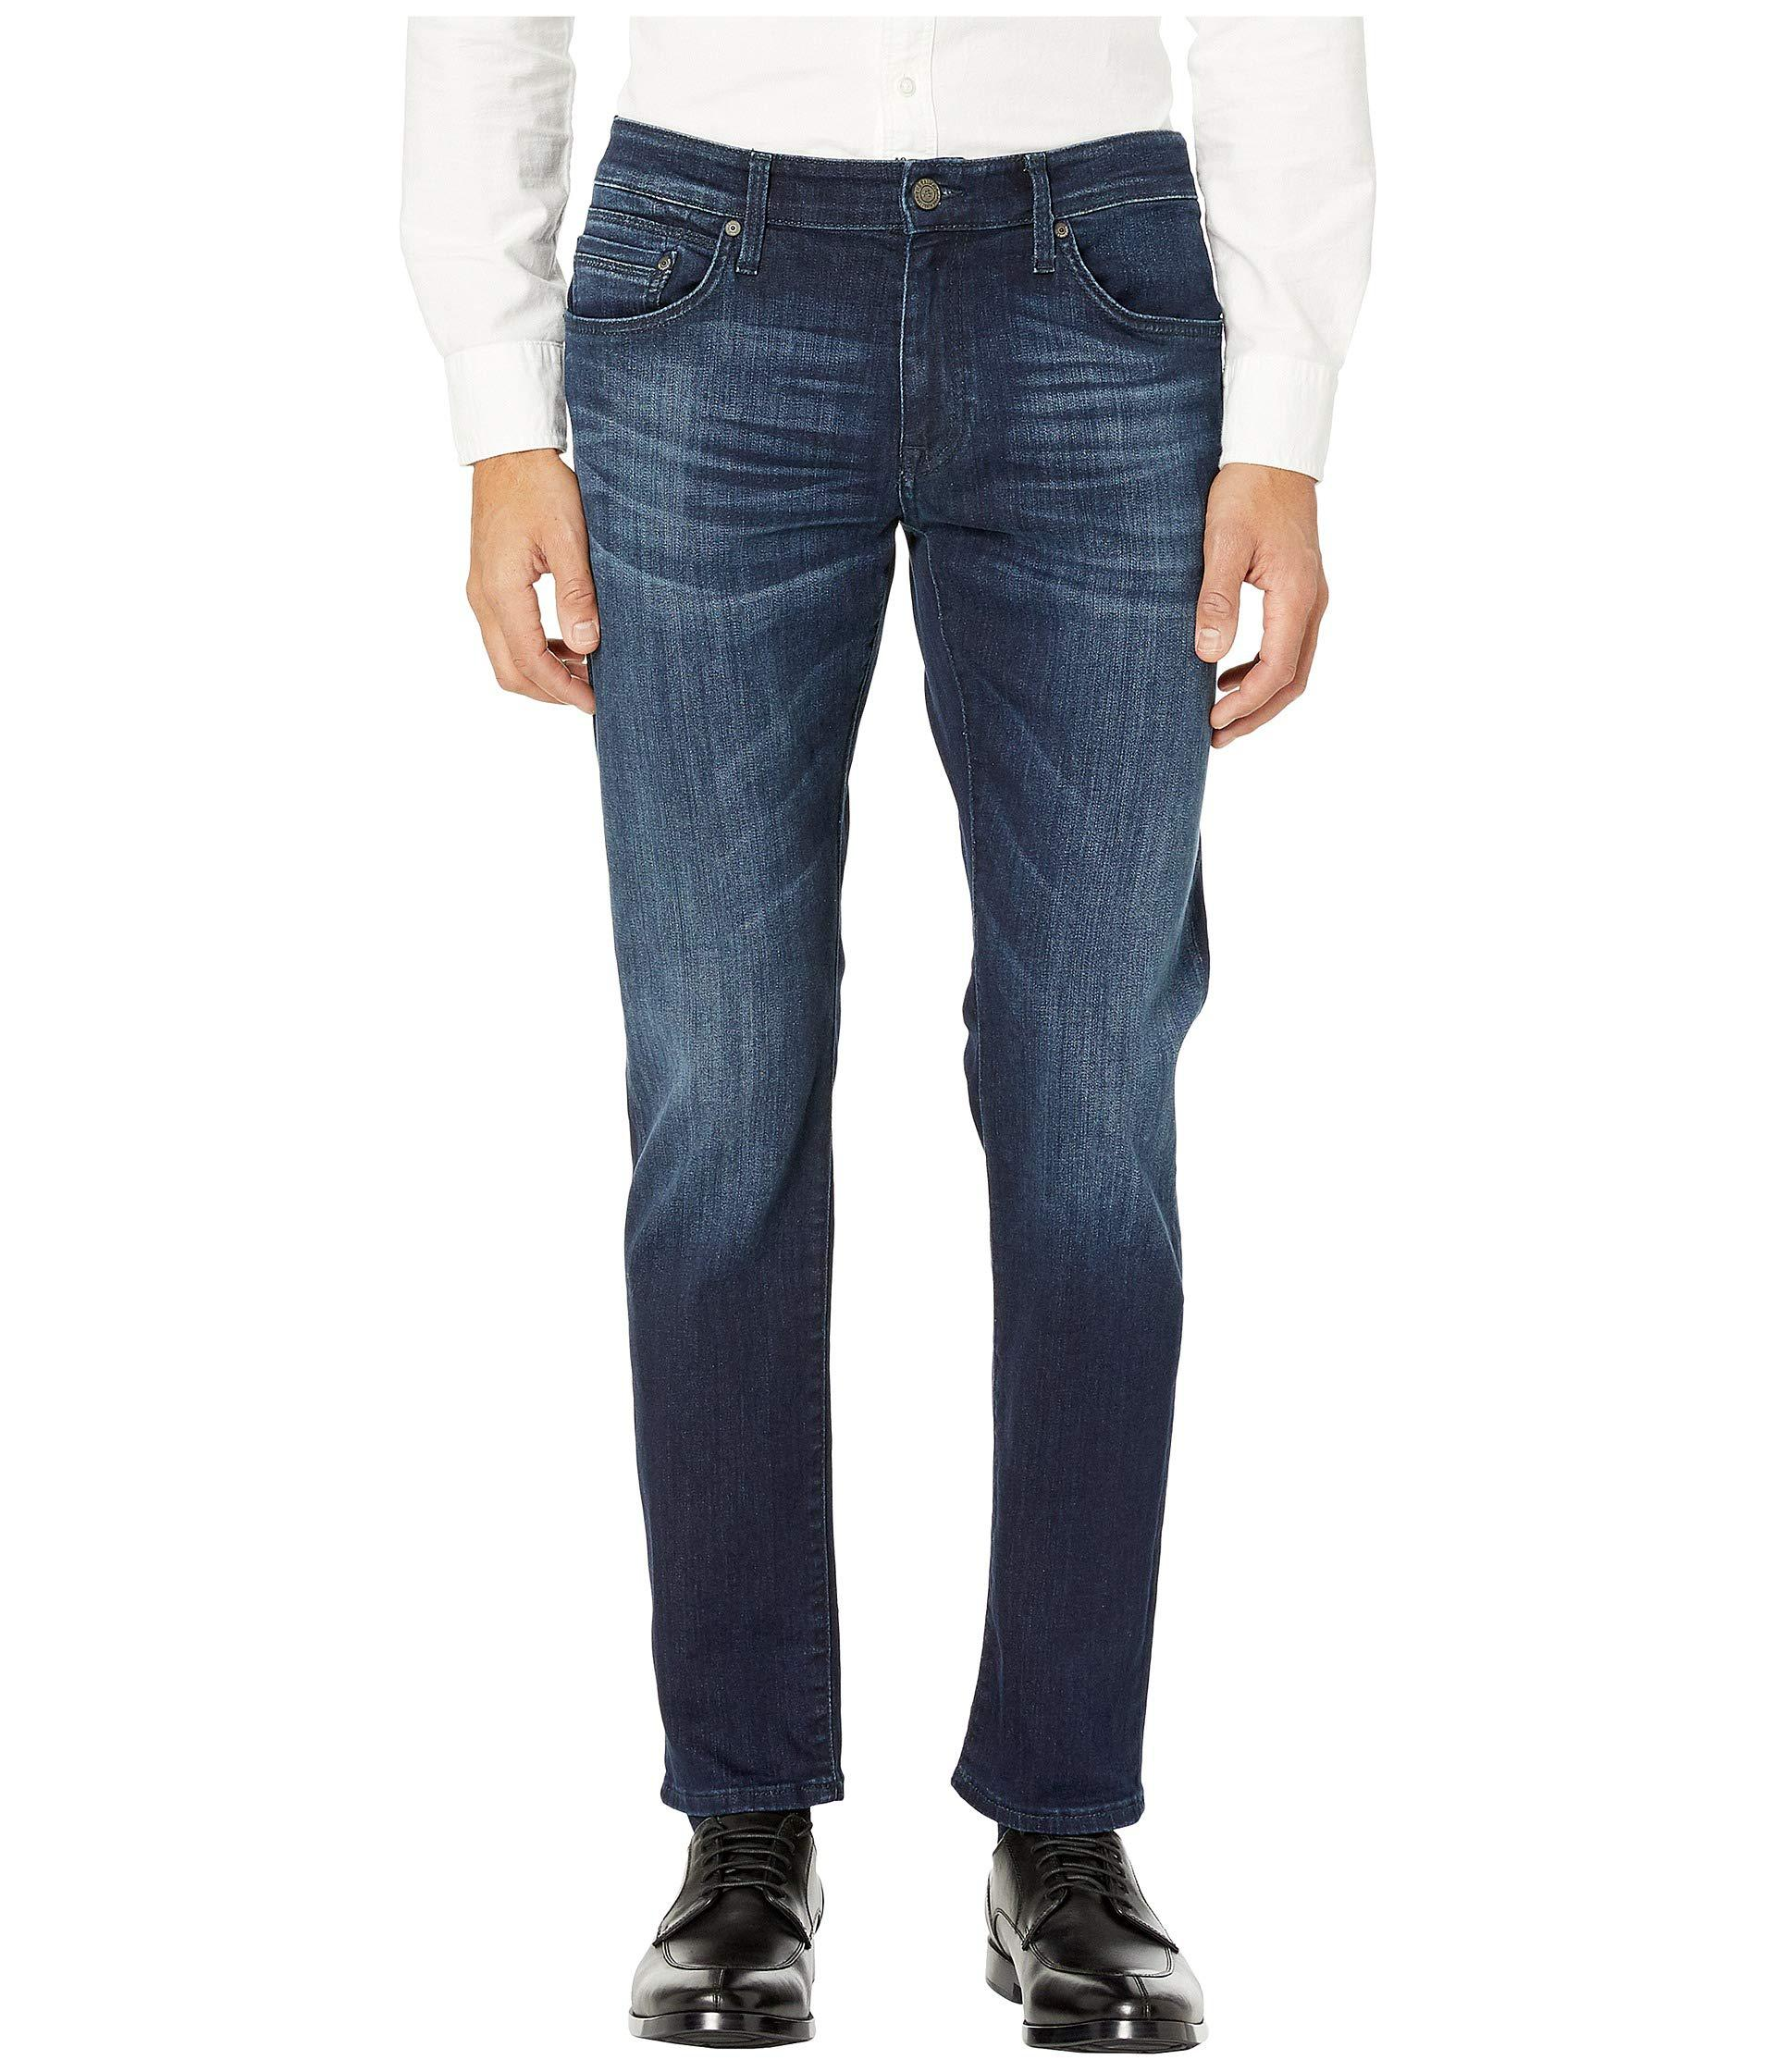 03933f53c75a5 Clothing, Shoes & Jewelry Mavi Jeans Mens Jake Slim in Dark Tonal  Williamsburg